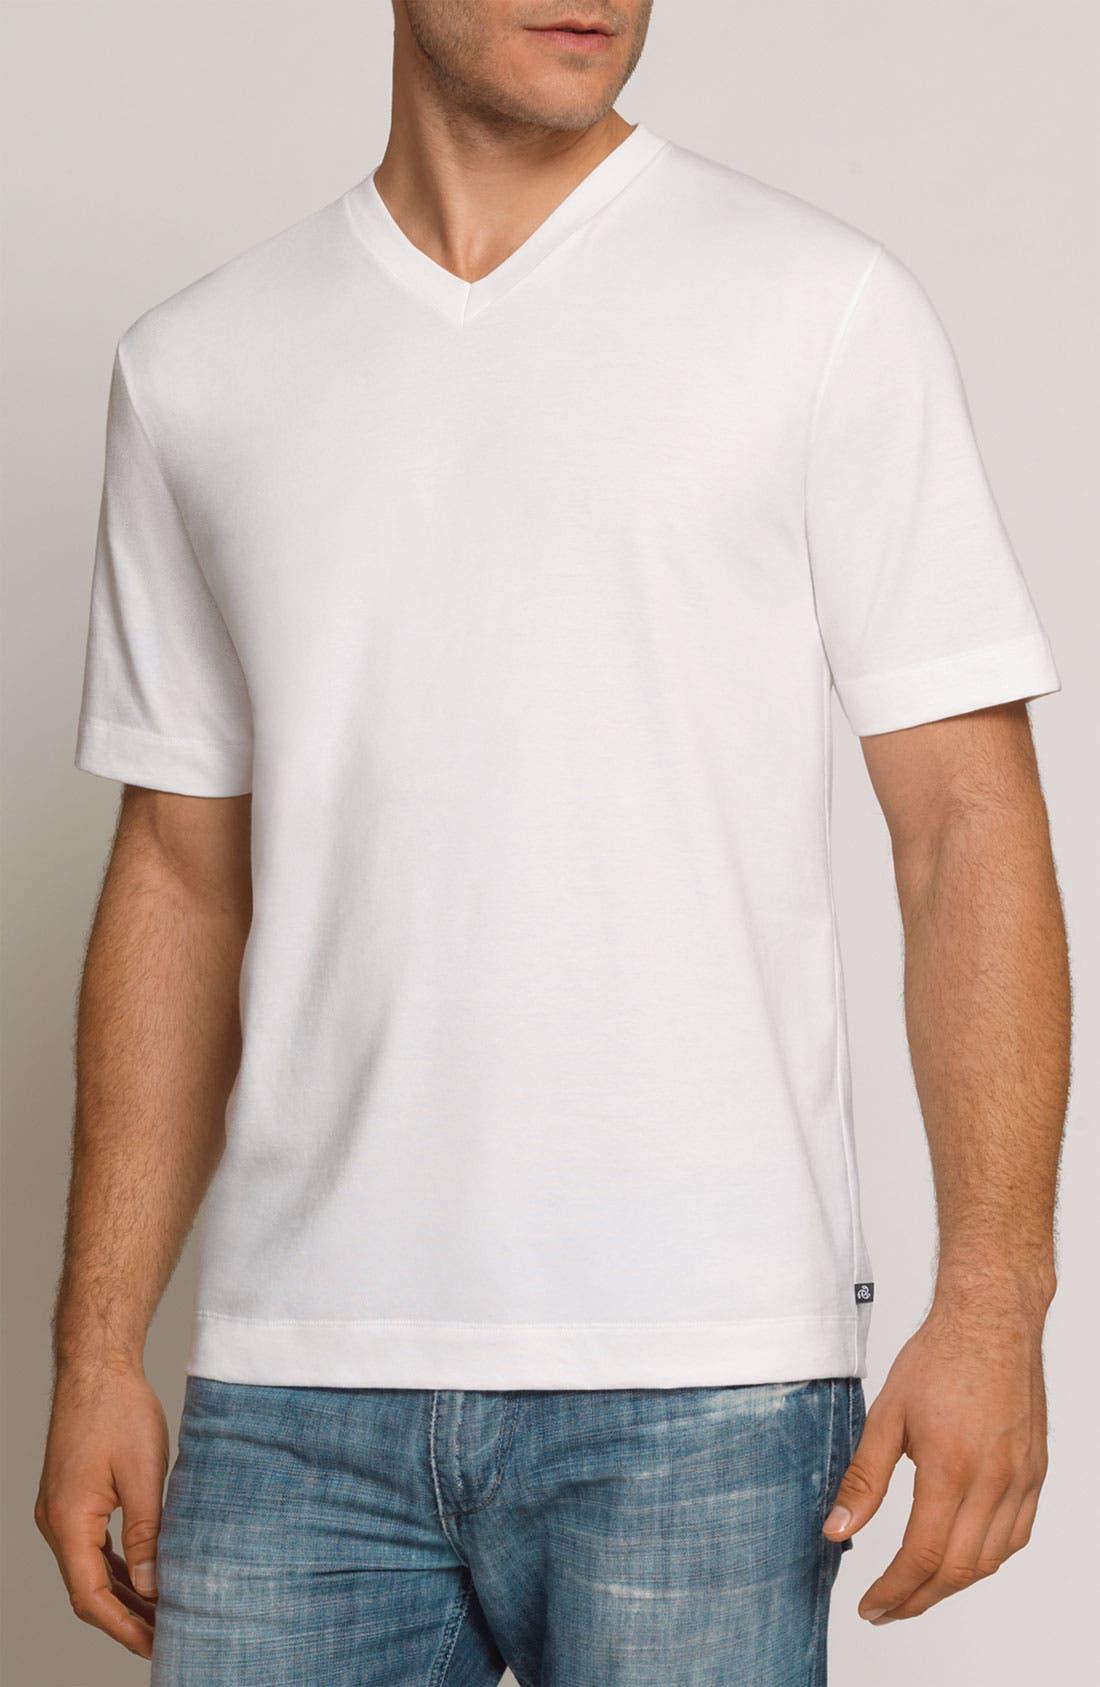 Alternate Image 1 Selected - Coopers by Jockey® 'Outlast' V-Neck T-Shirt (2-Pack)